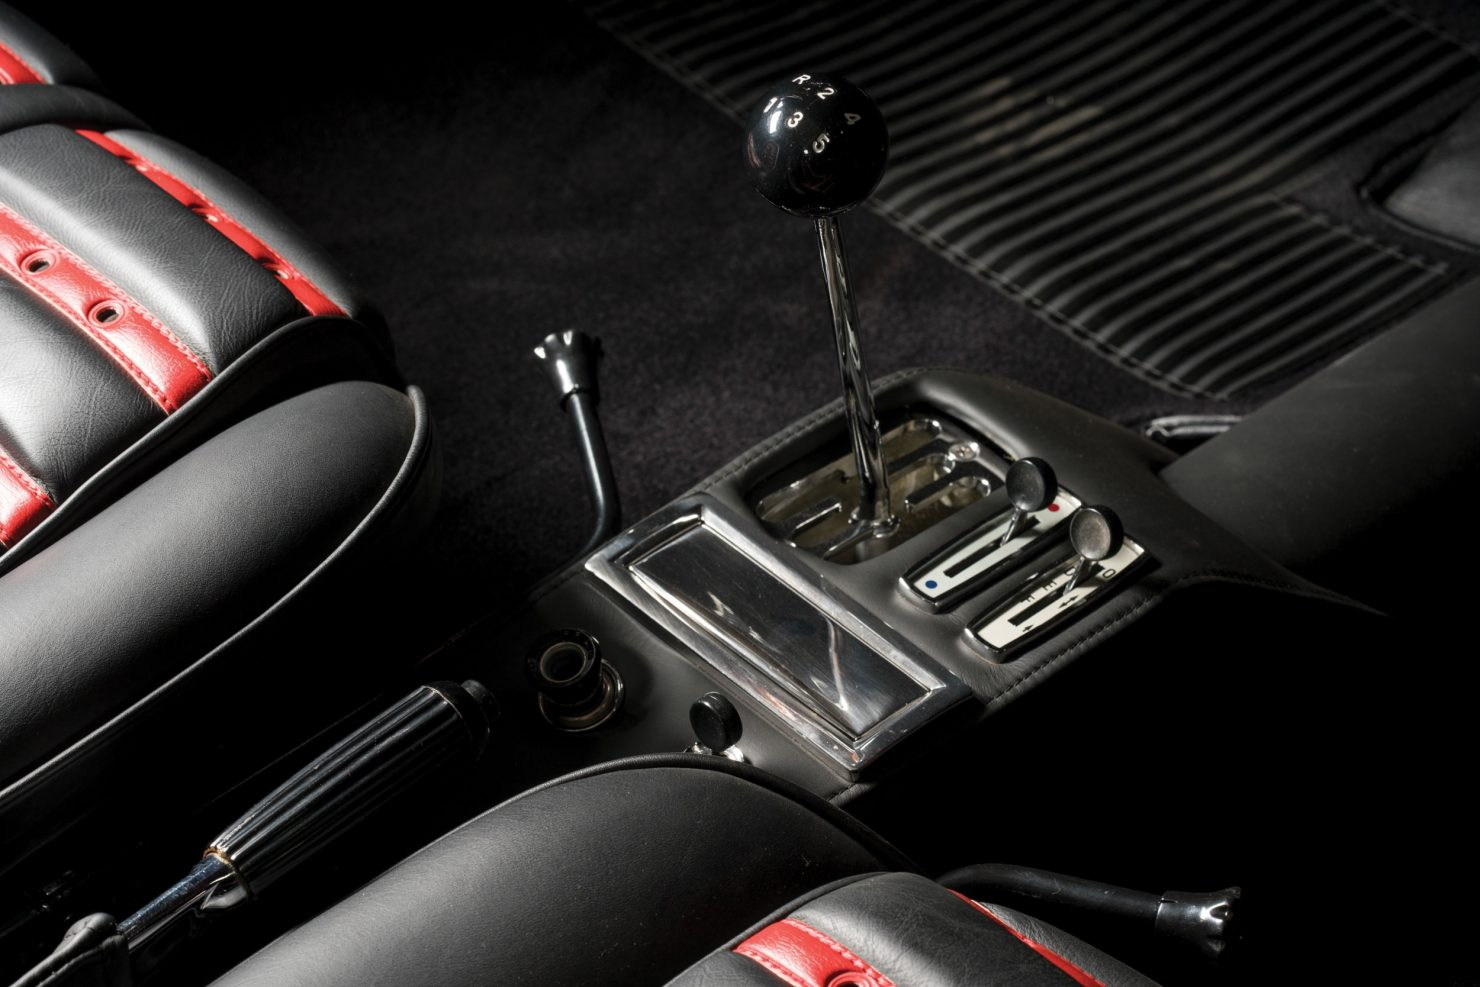 ferrari dino 246 14 1480x987 - 1969 Ferrari Dino 246 GT